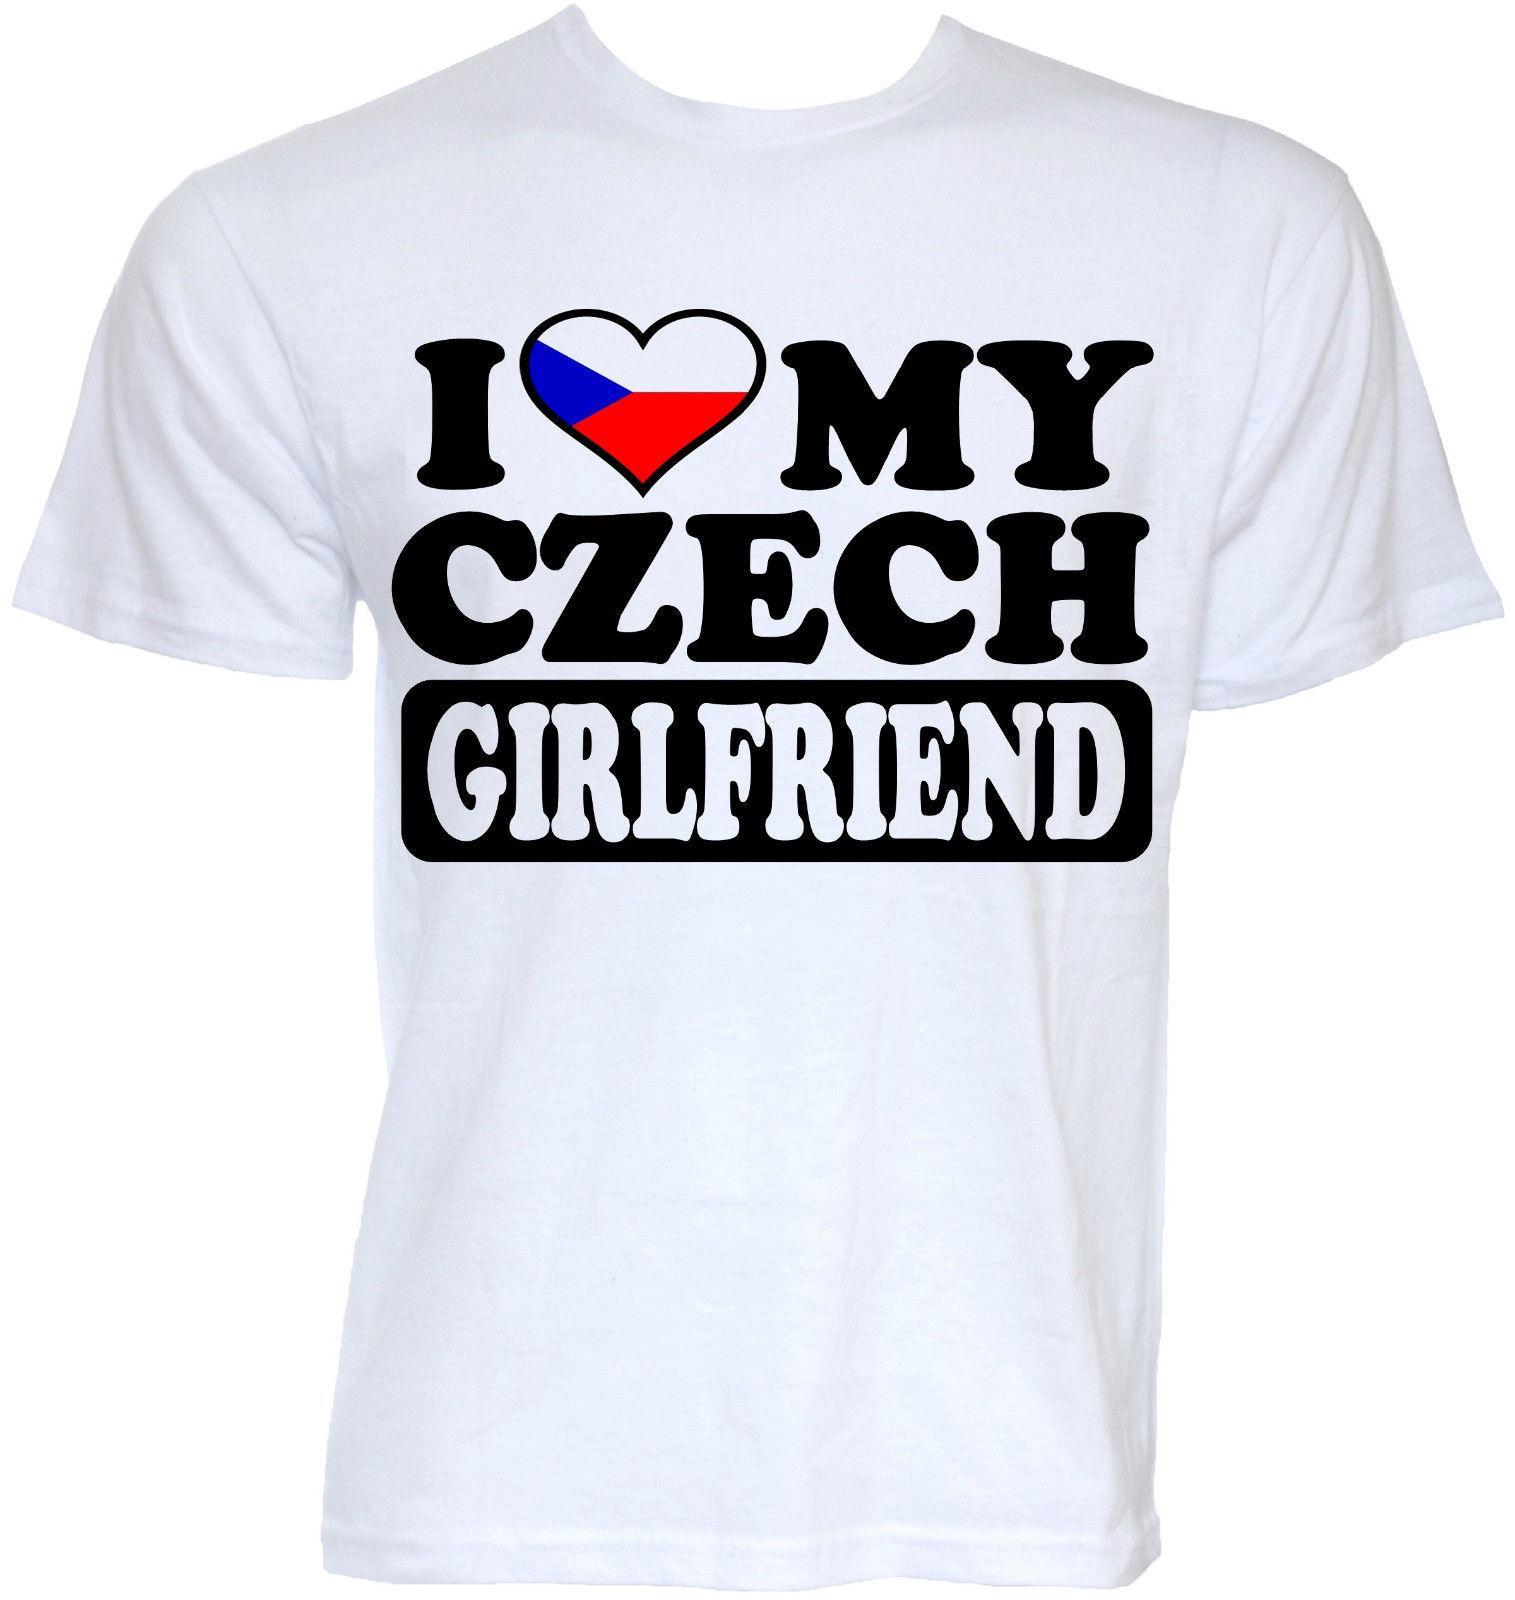 a9a08aa2 Mens Funny Cool Novelty Czech Girlfriend Czech Republic Flag Joke T Shirts  Gifts Print T Shirt Fashion Short Sleeve T Shirts In A Day Awesome Tee Shirt  ...